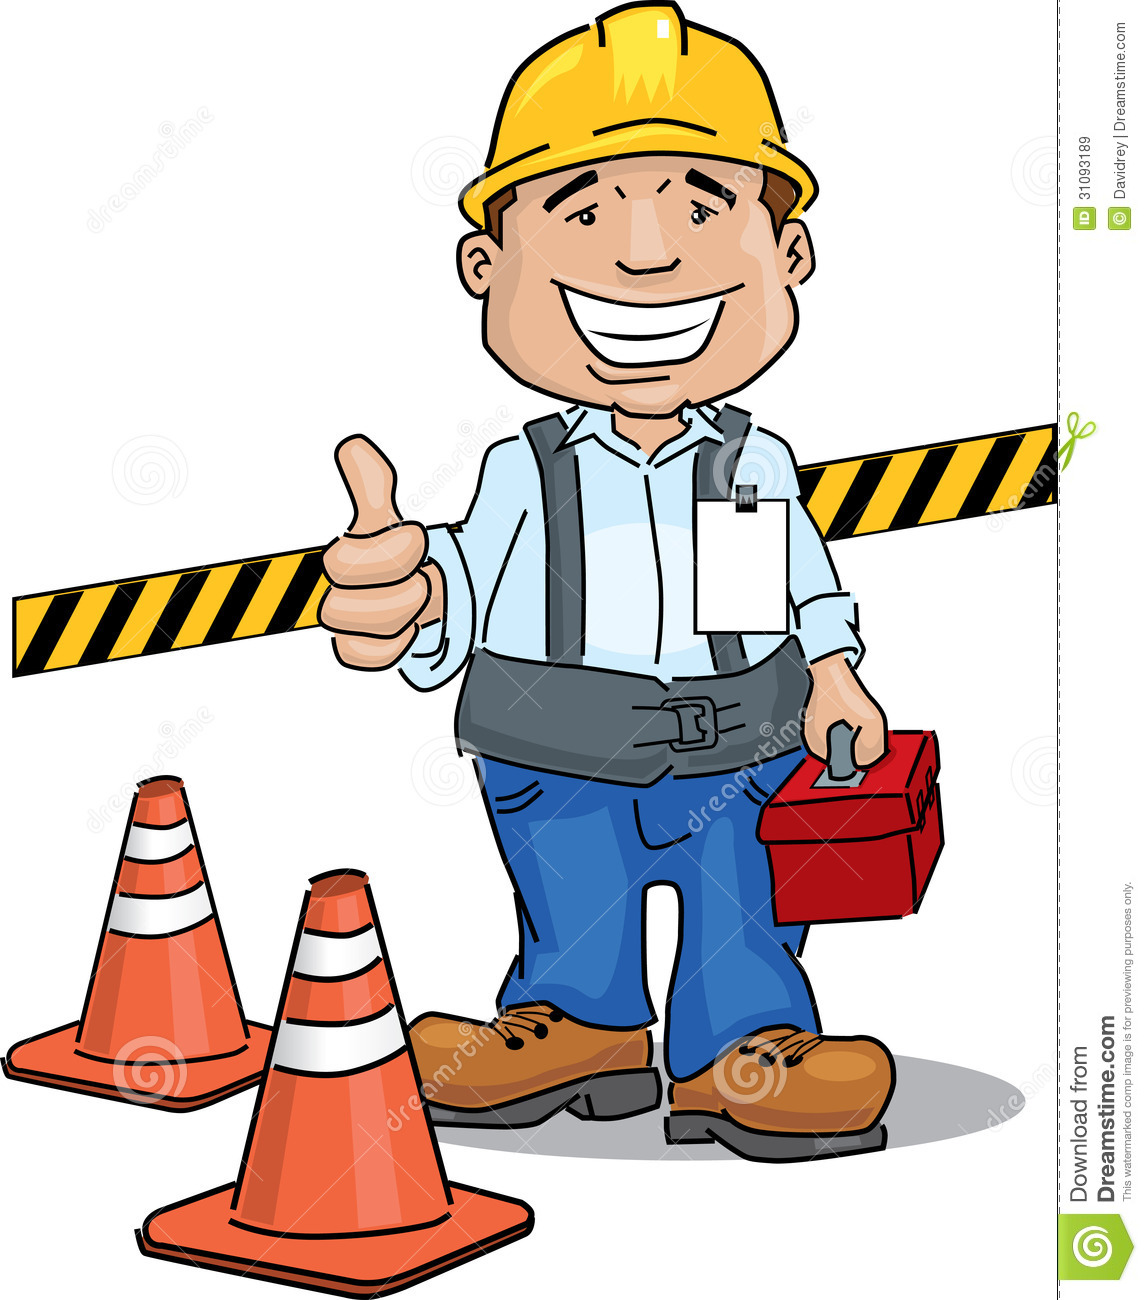 Jobs clipart construction, Jobs construction Transparent.